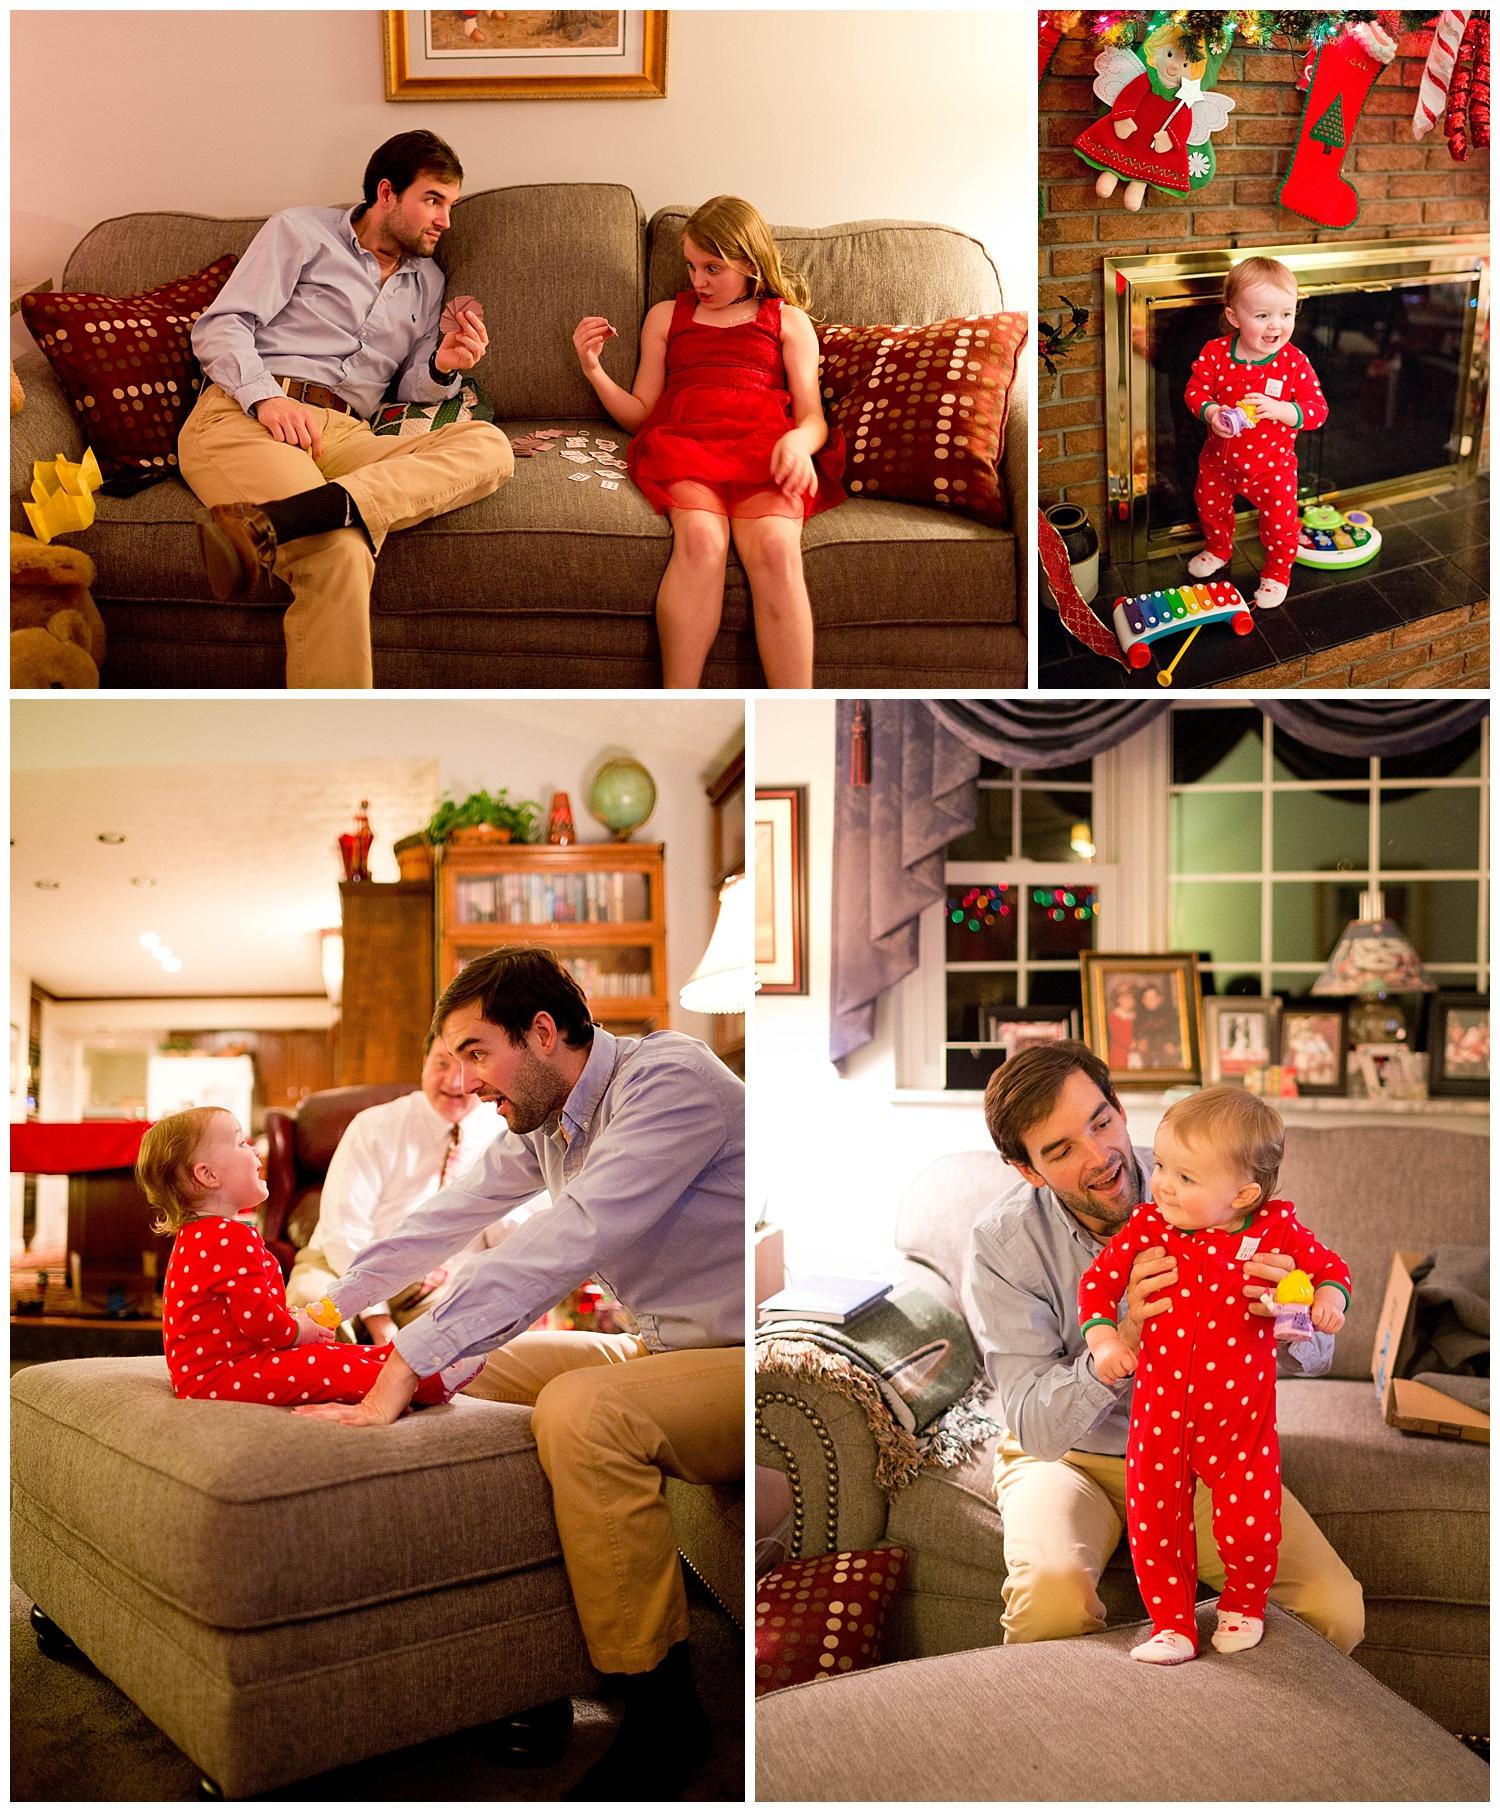 family fun on Christmas Eve